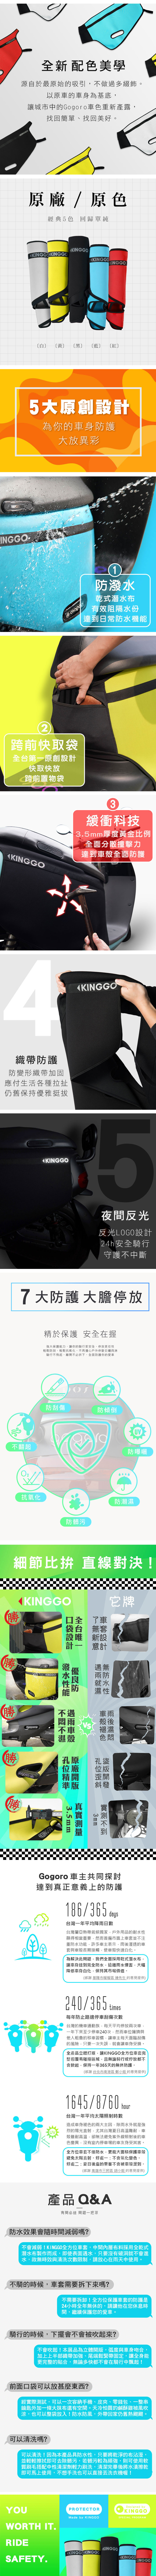 ▶24HR發貨▶【台灣原創口袋車套】KINGGO gogoro 2代車系全能防護『跨前口袋』防刮車套 騎乘版雙面防水加厚